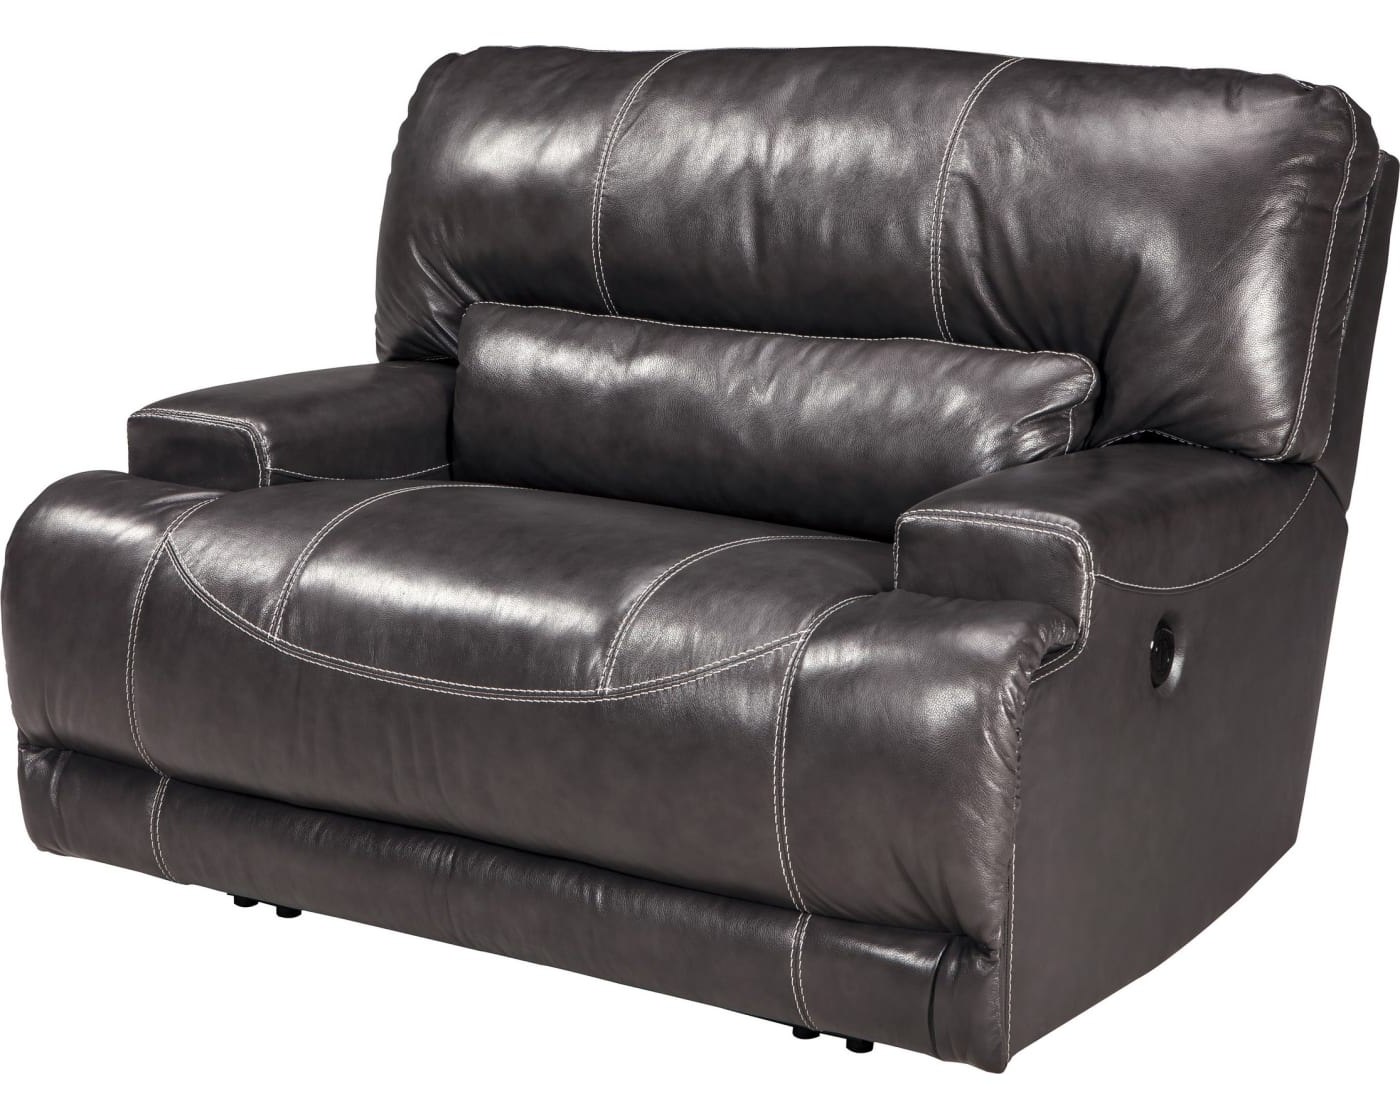 Walker Gray Power Reclining Sofas For Popular Signature Designashley Mccaskill Gray Wide Seat Power (View 2 of 20)